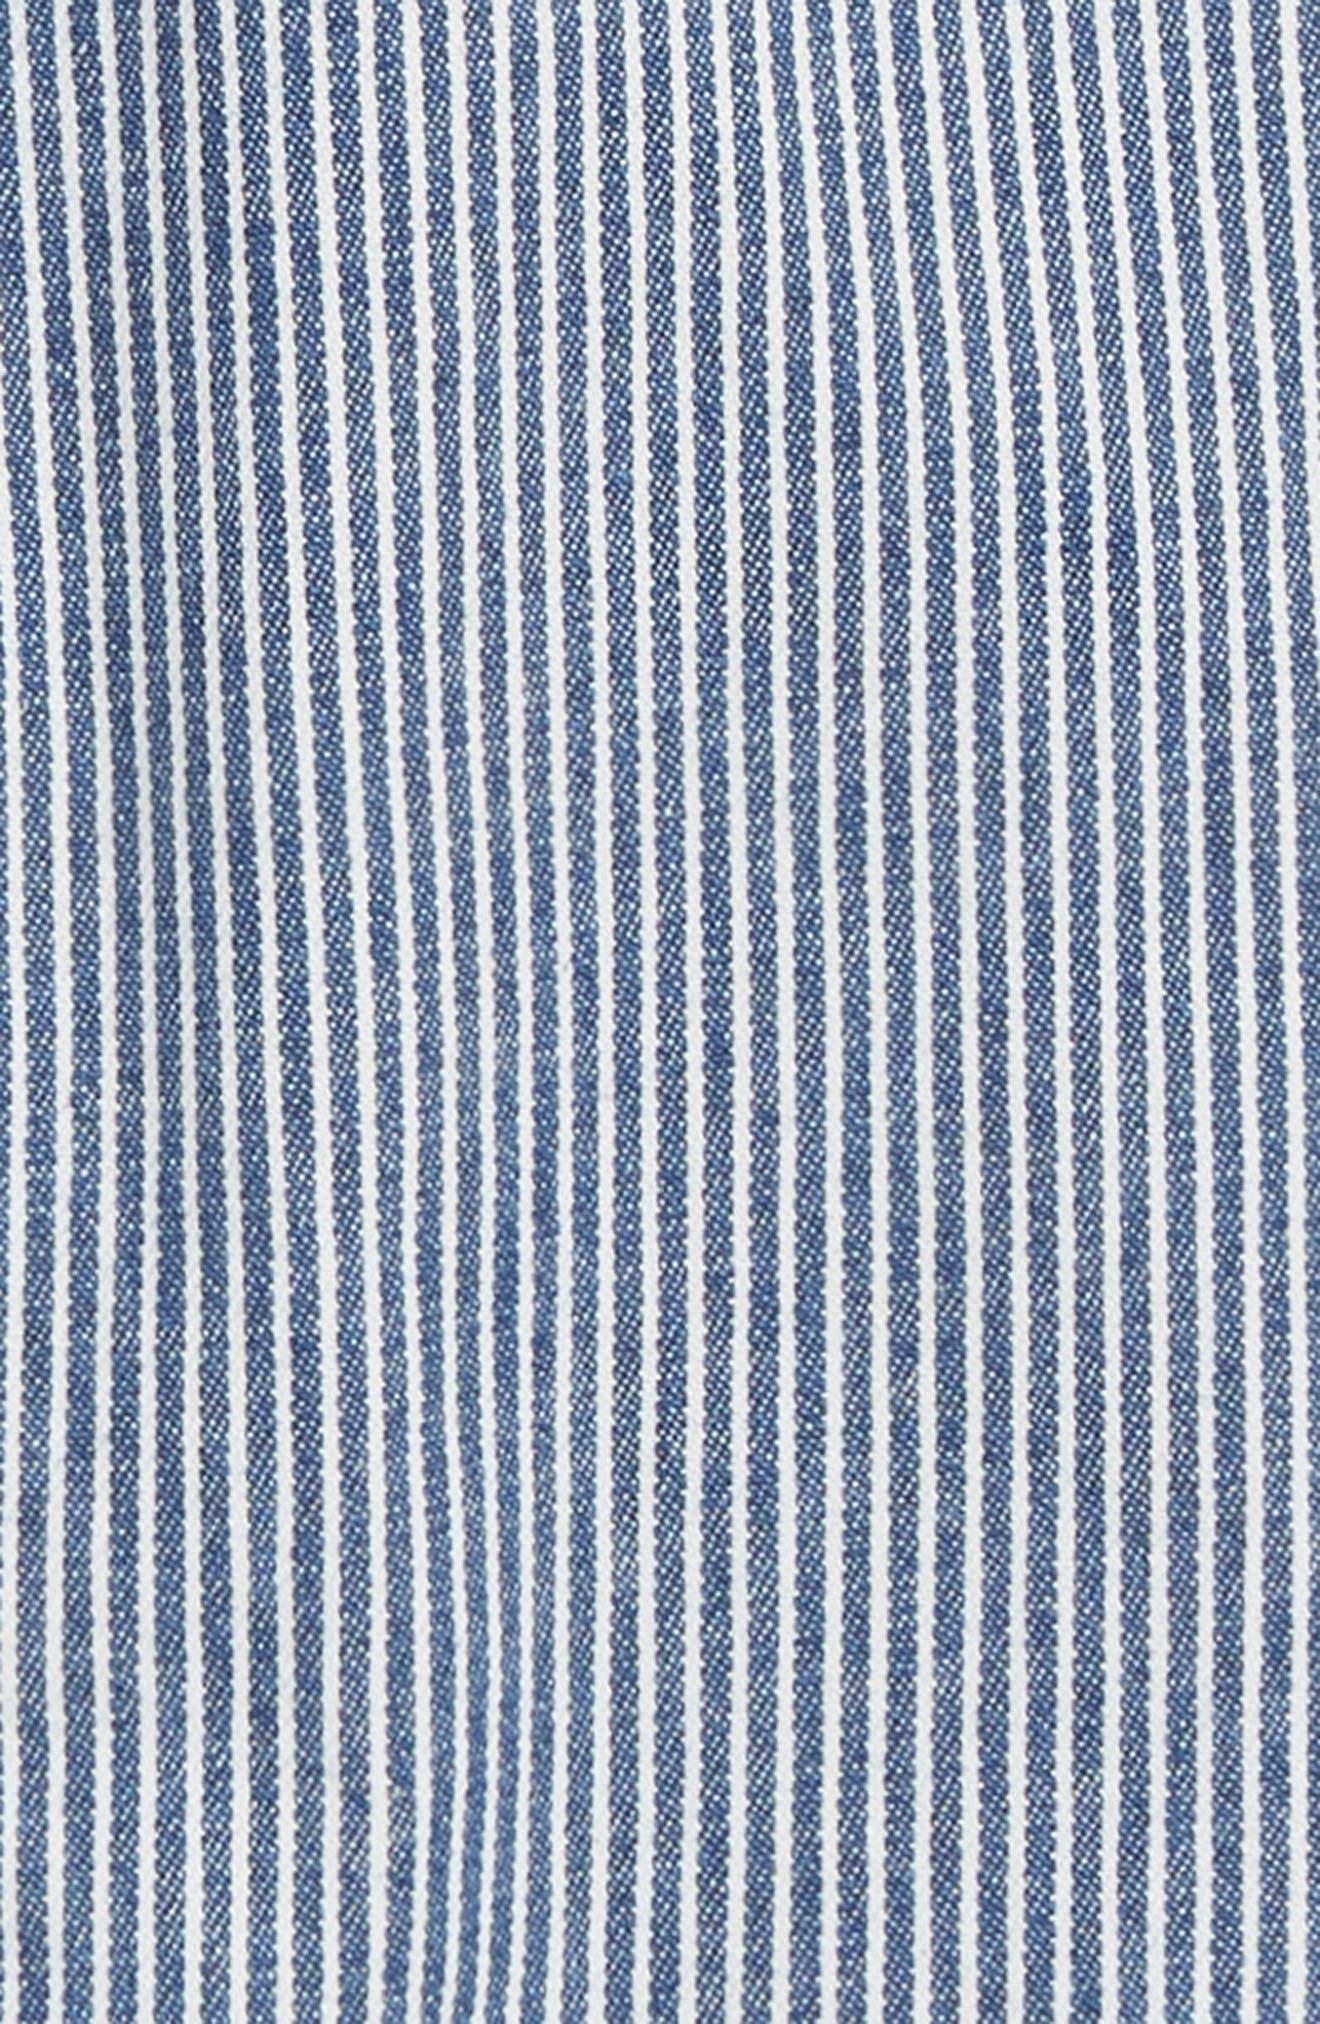 Ticking Stripe Chino Pants,                             Alternate thumbnail 2, color,                             BLU DUKE BLUE TICKING